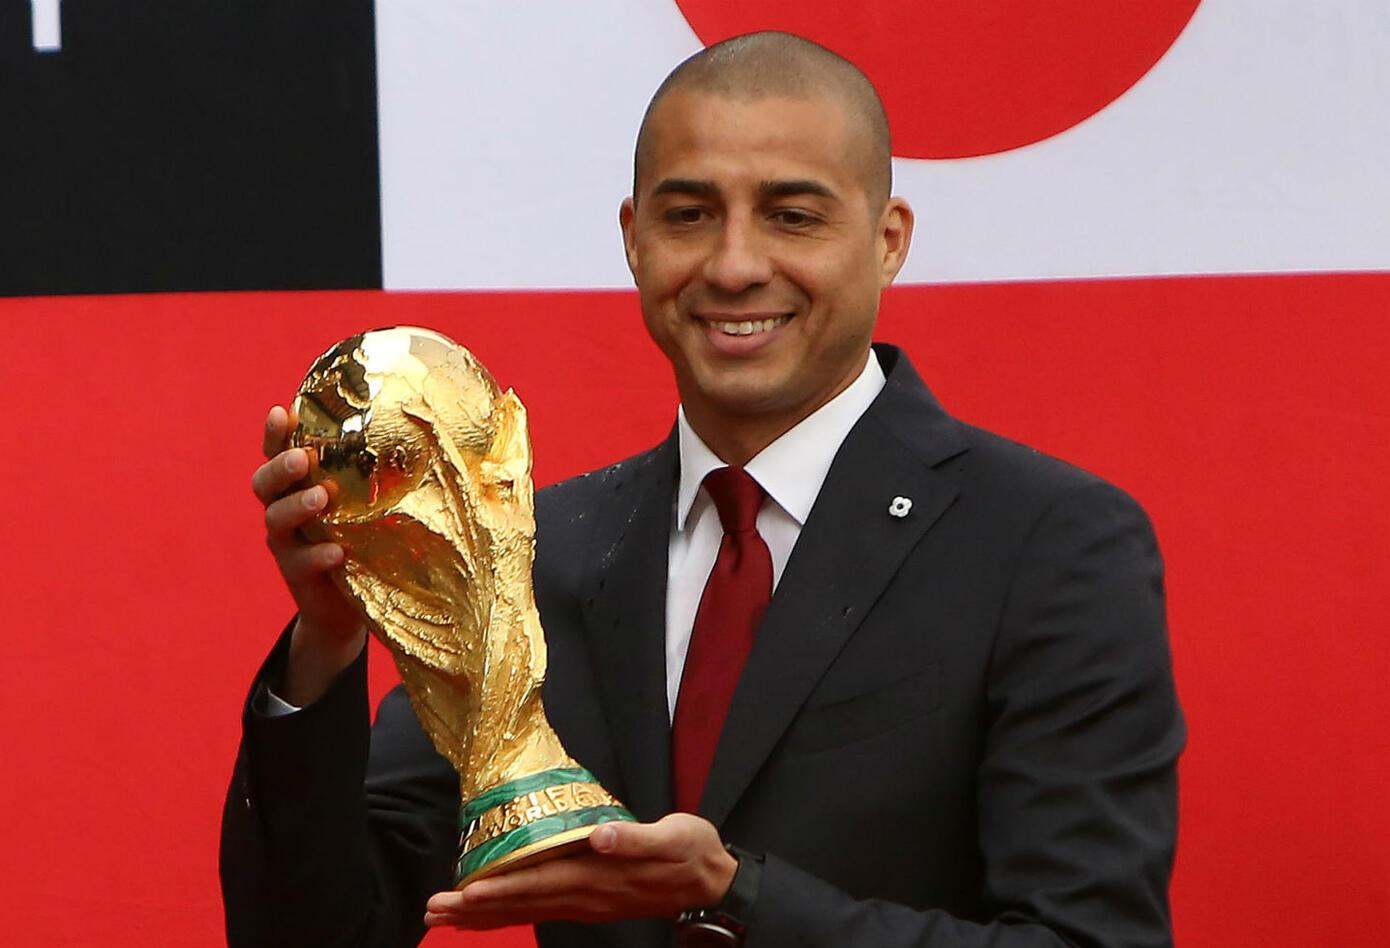 La Copa Mundo llegó a Colombia